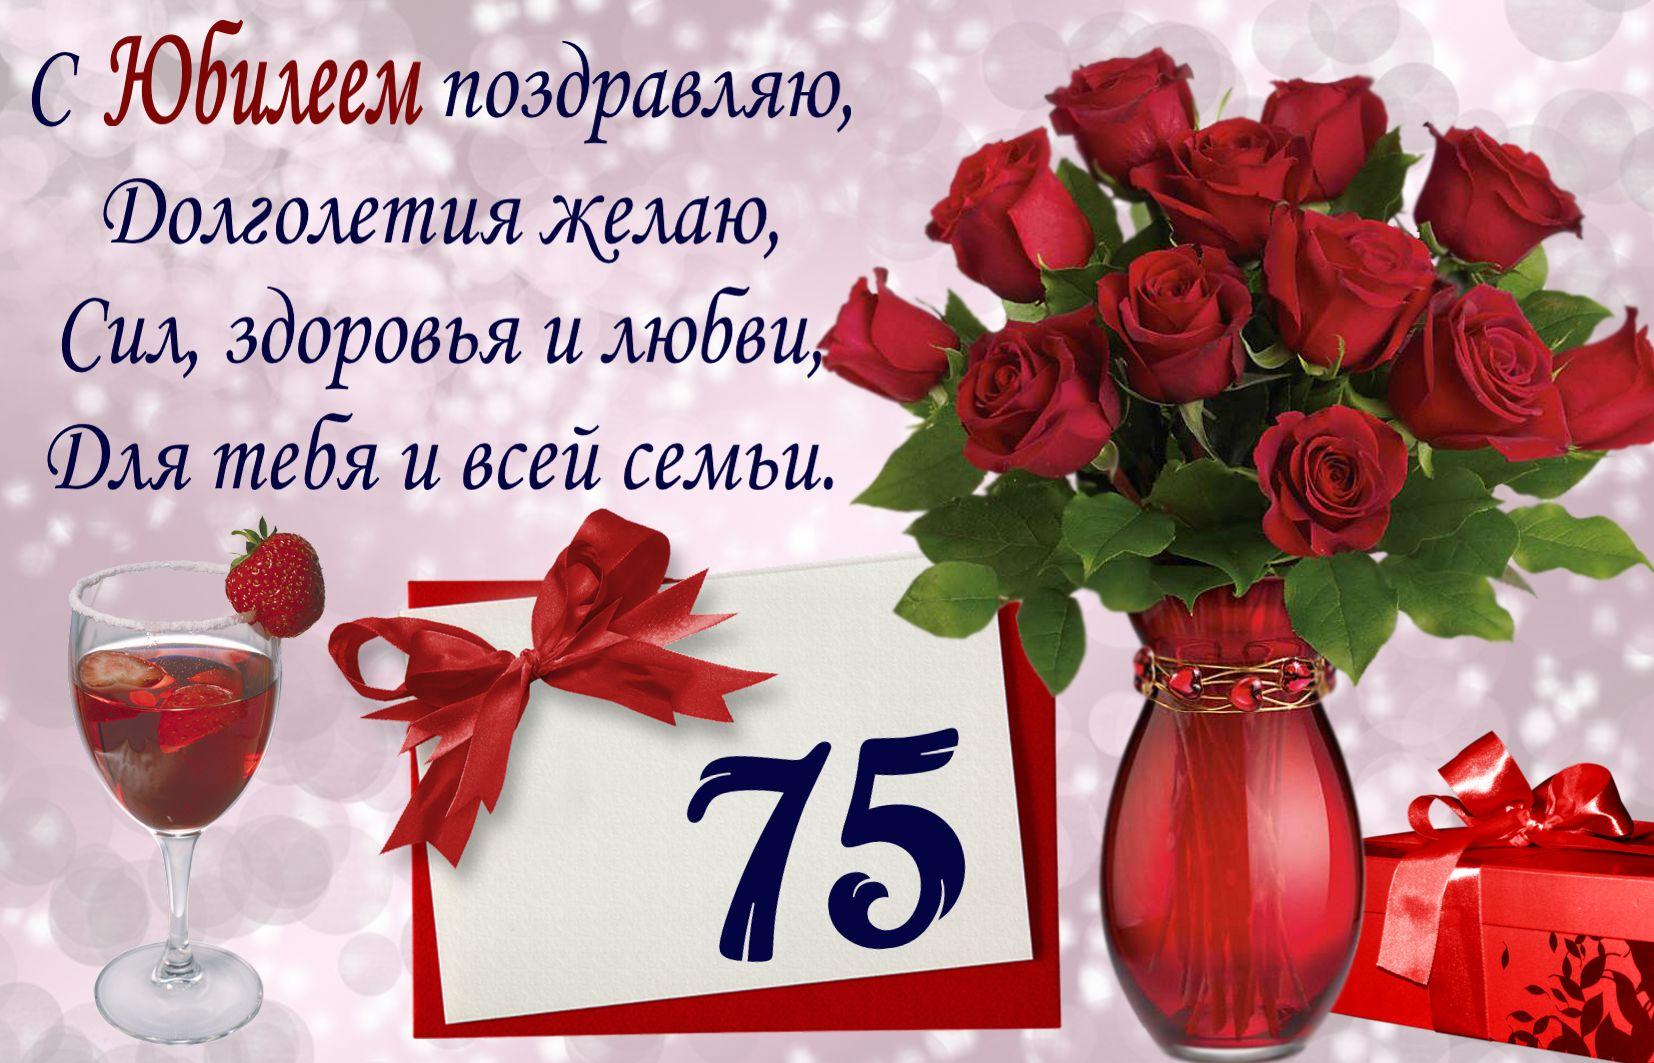 Открытка на юбилей 75 лет - букет роз в вазе на красивом фоне